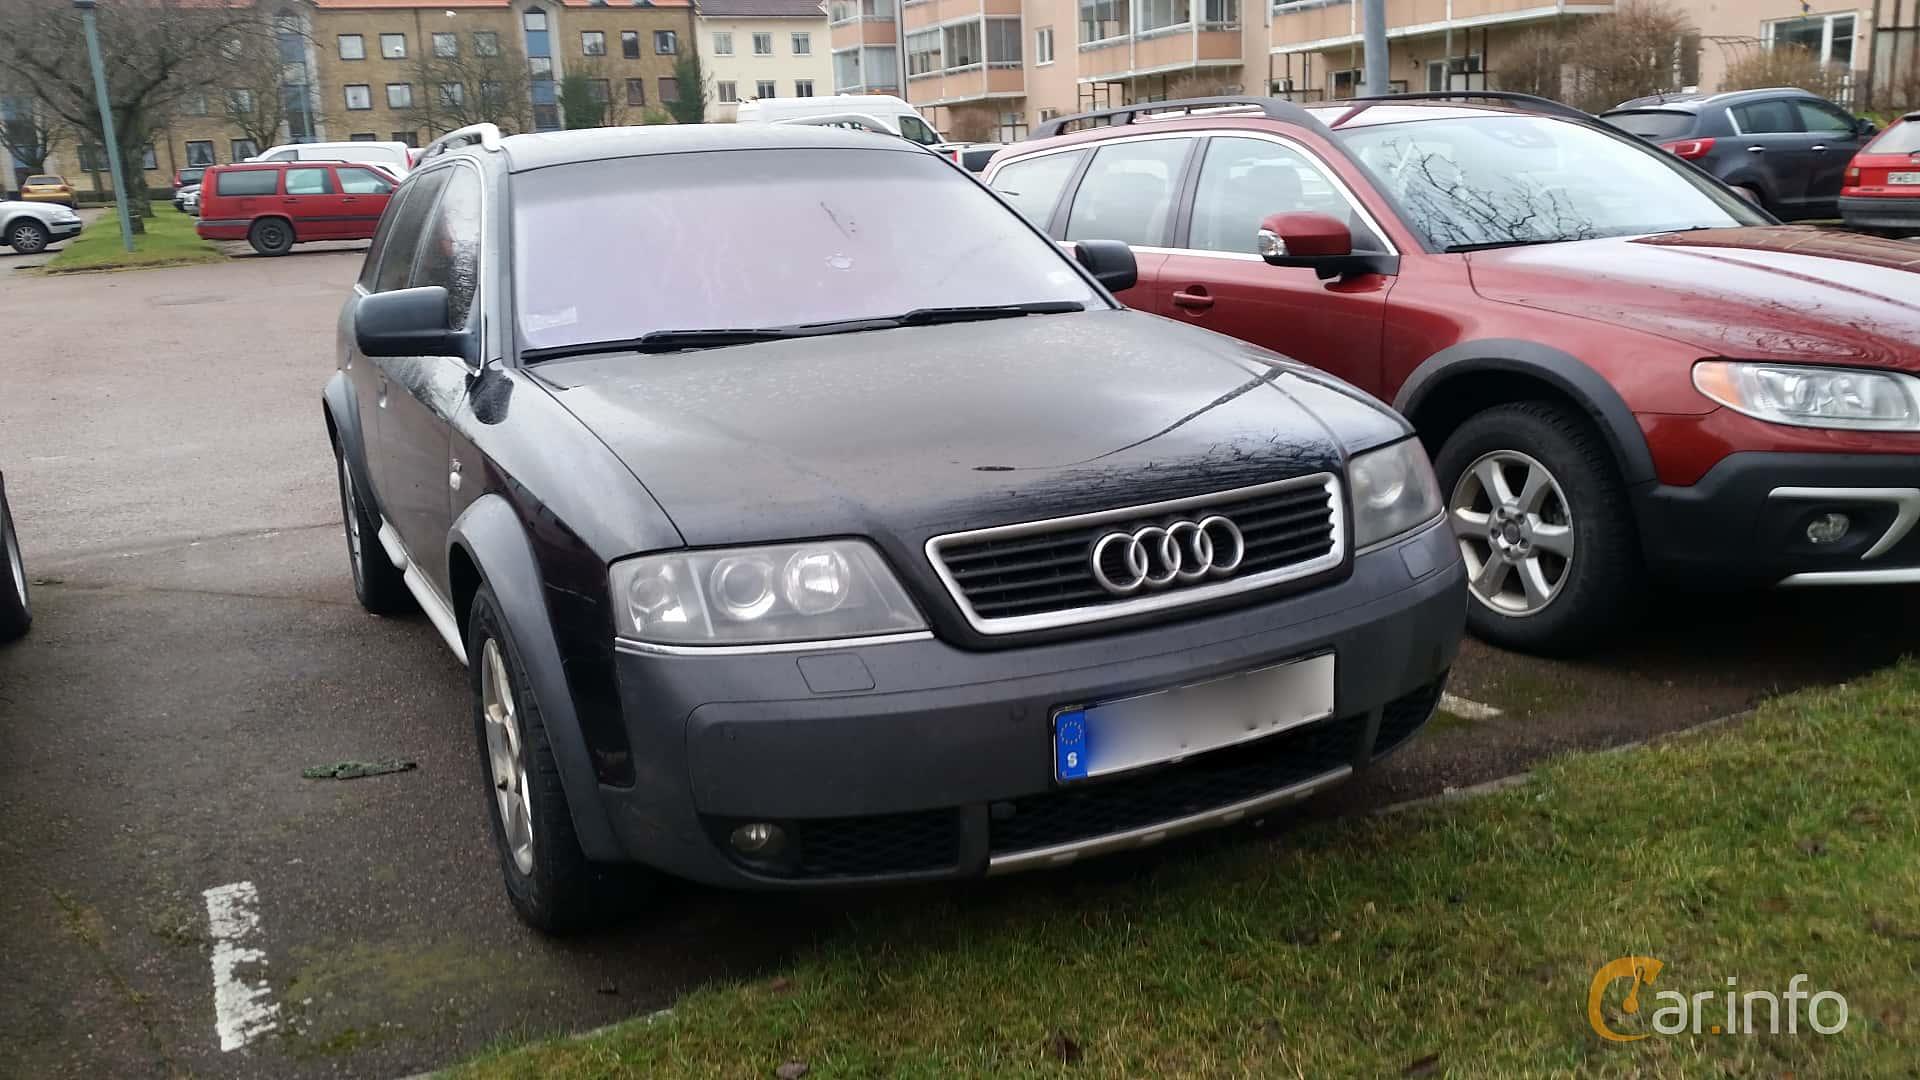 Kekurangan Audi A6 4.2 V8 Spesifikasi